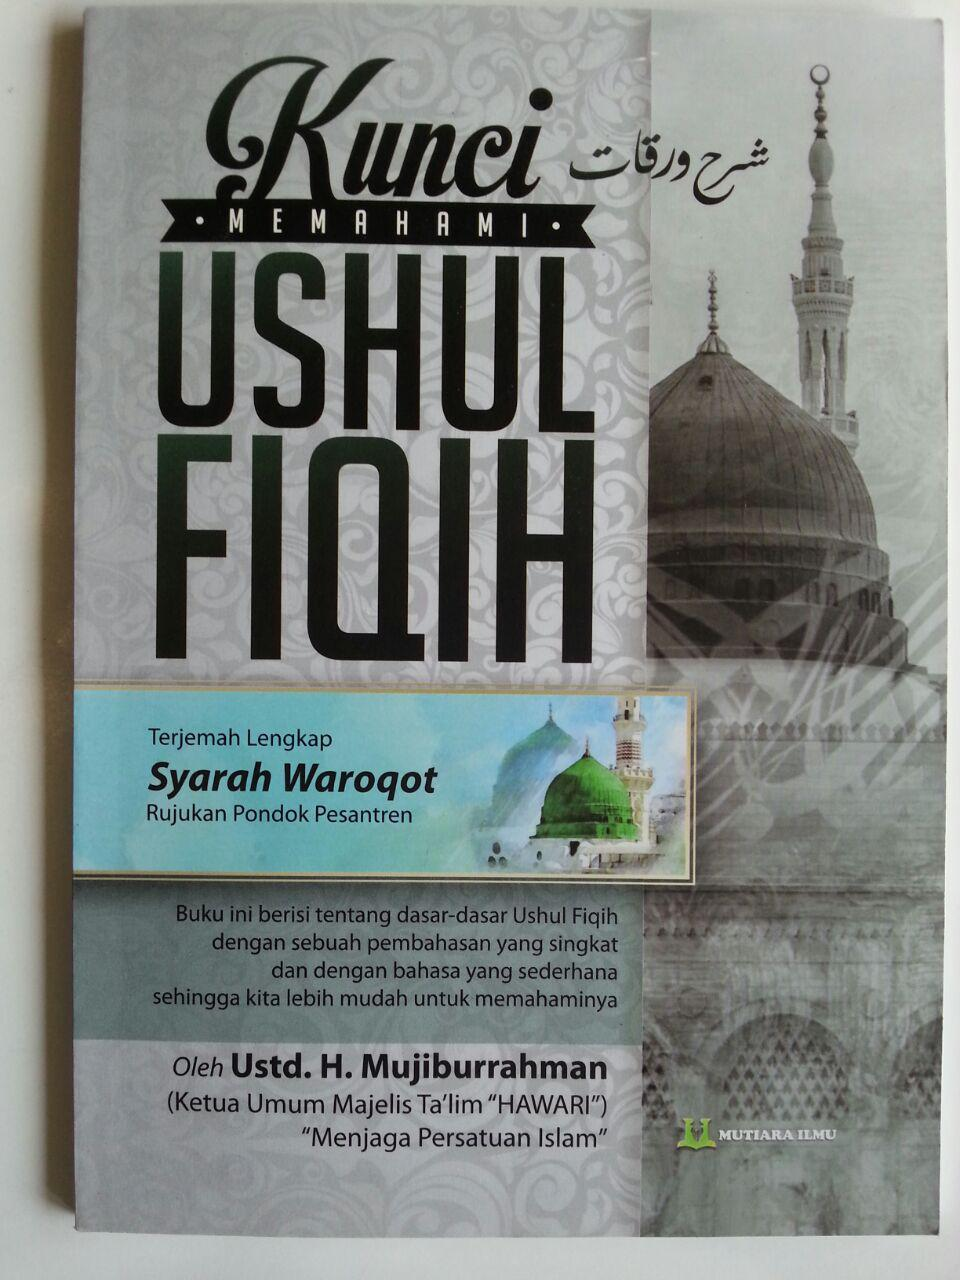 Buku Terjemah Syarah Waroqot Kunci Memahami Ushul Fiqh cover 2